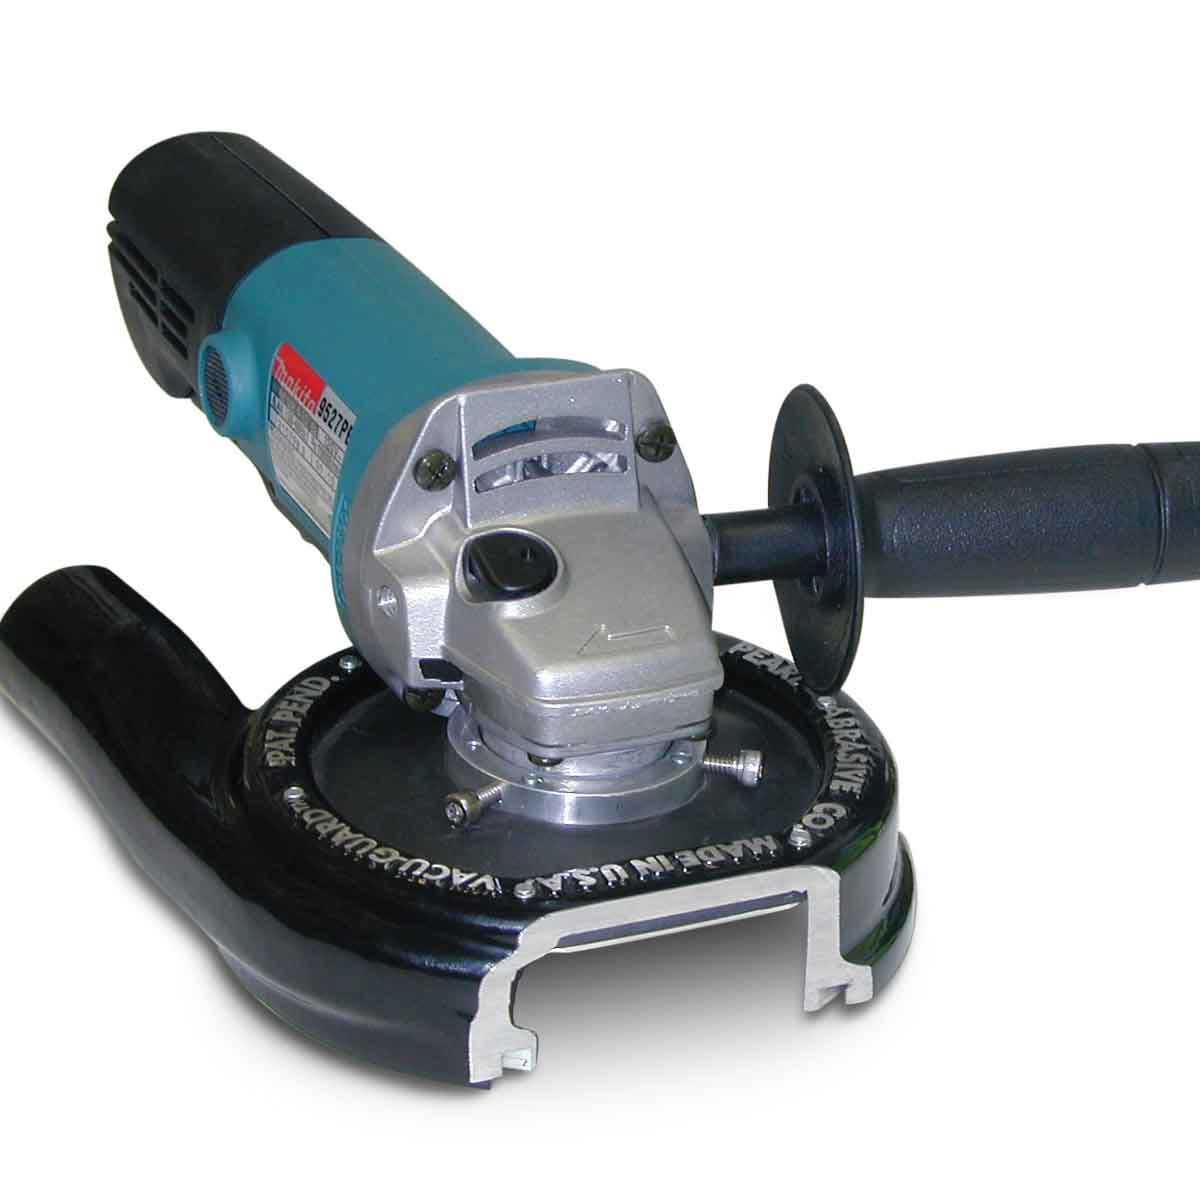 pearl vacu-guard angle grinder adapter